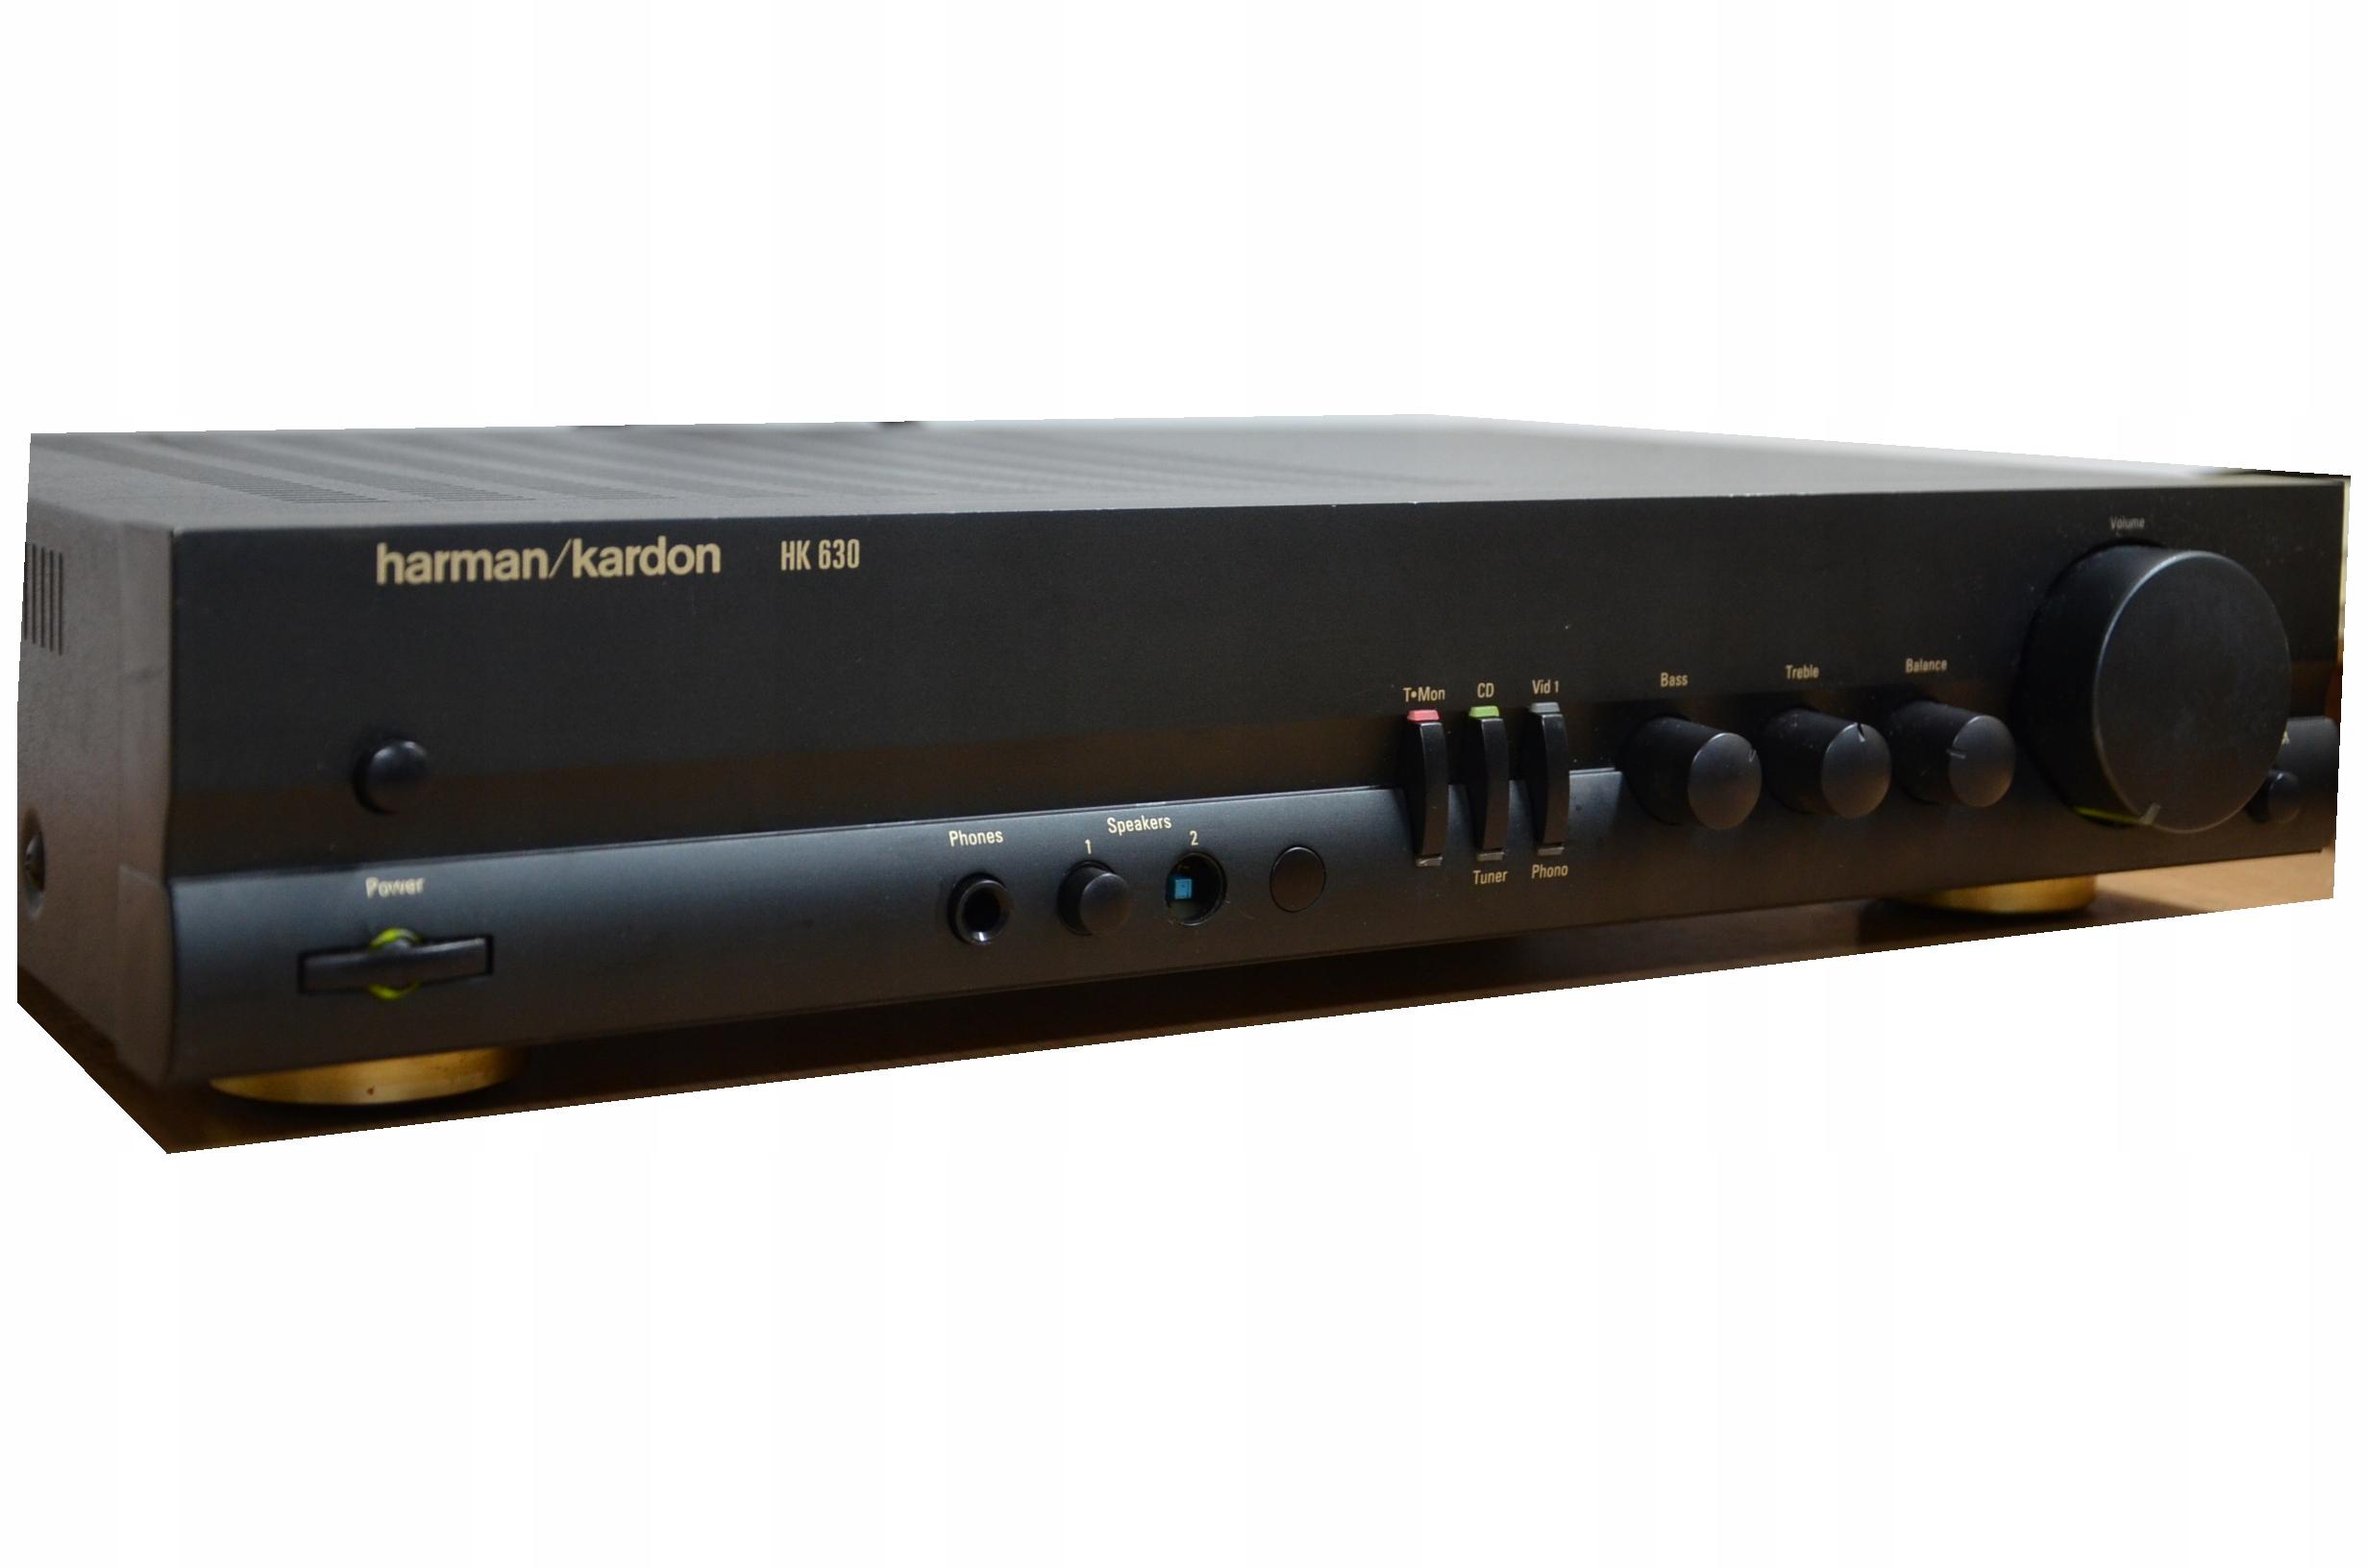 HARMAN KARDON HK-630 WZMACNIACZ SUPER OKAZJA!!!